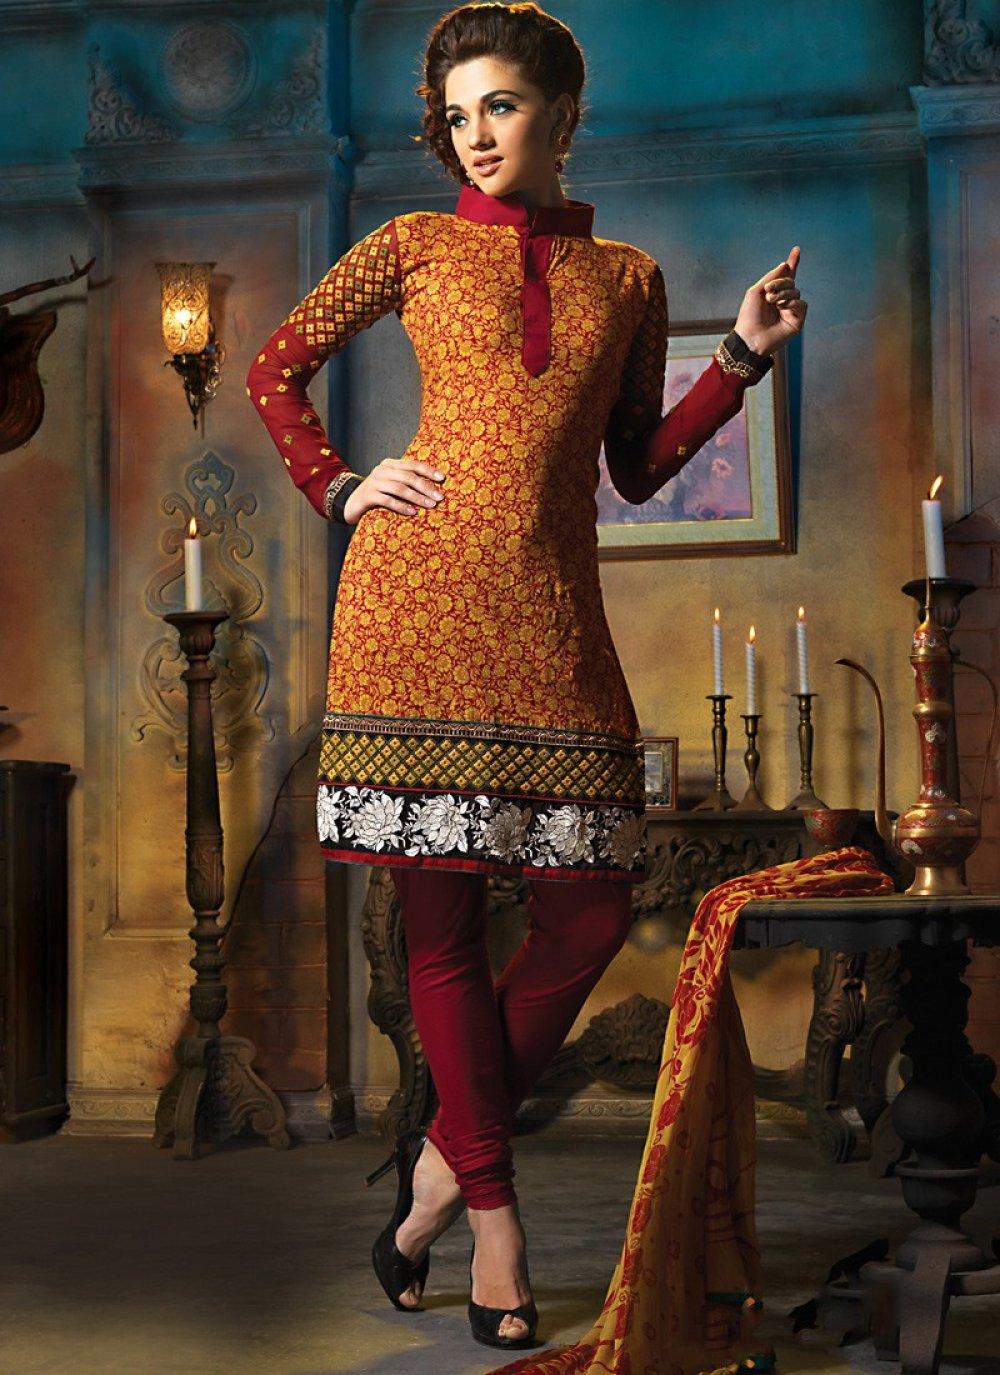 Brick Red & Orange Salwar Kameez